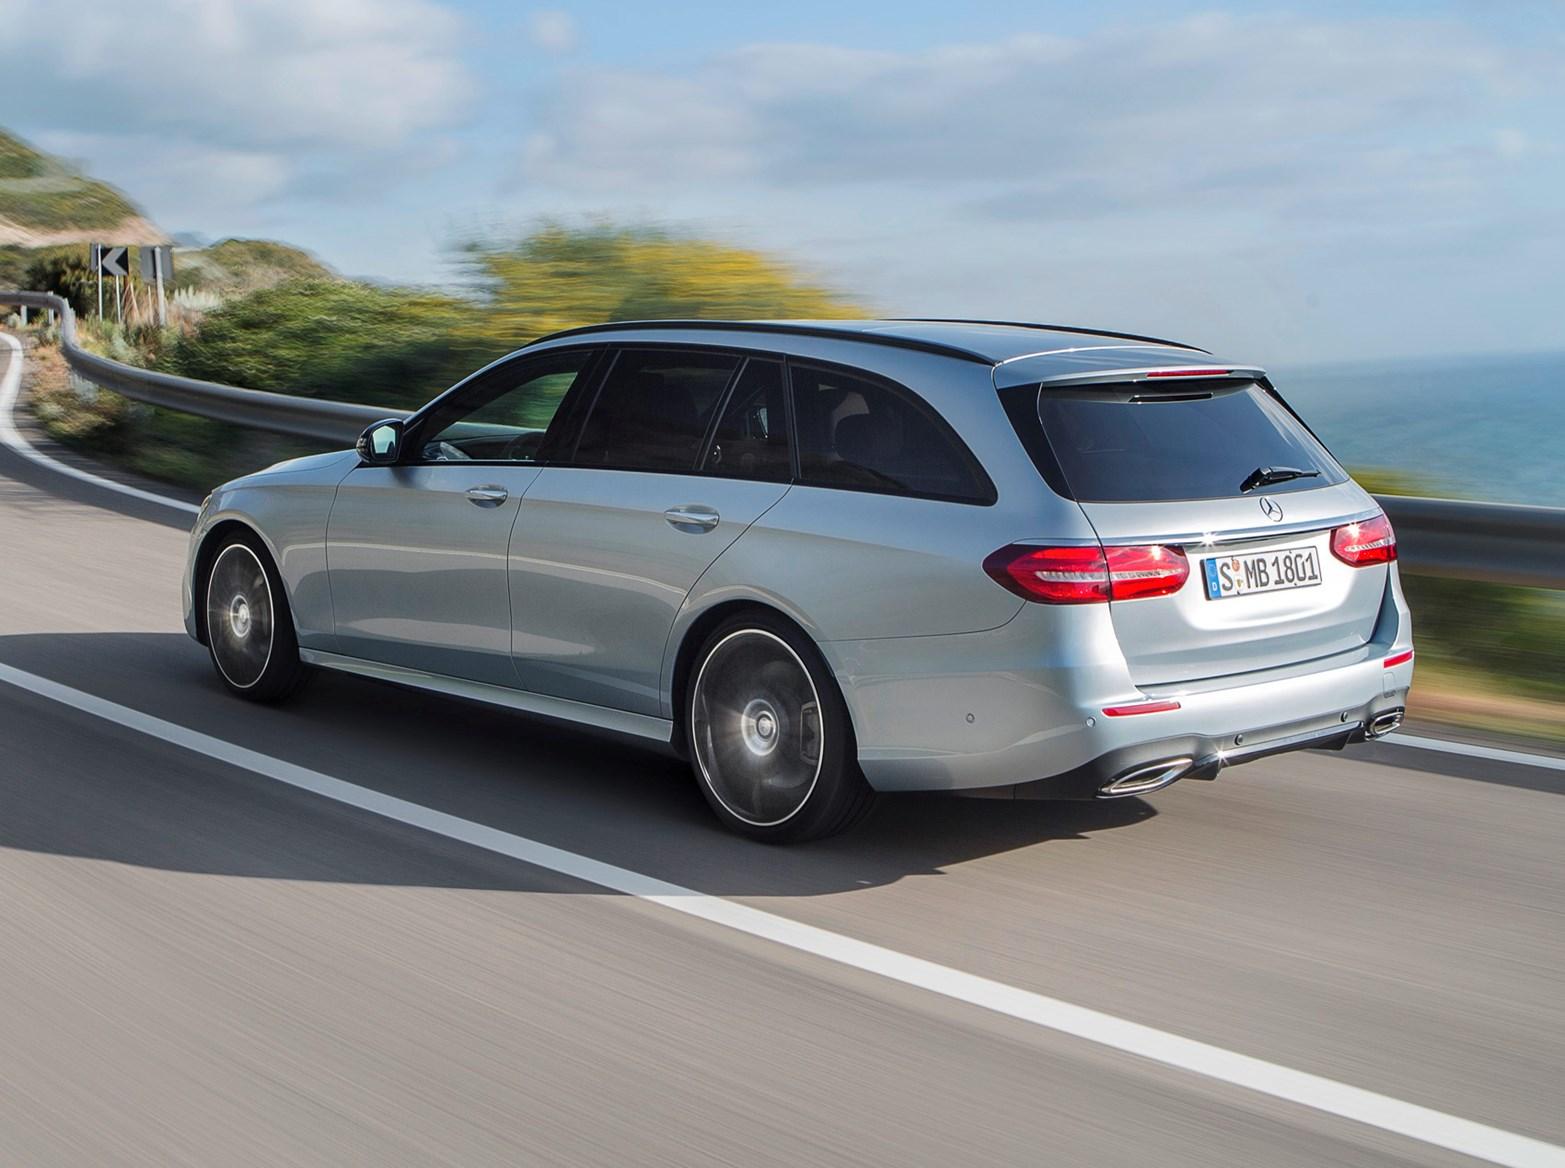 All Types mercedes e class estate 2010 : Mercedes-Benz E-Class Estate (2016 - ) Photos | Parkers